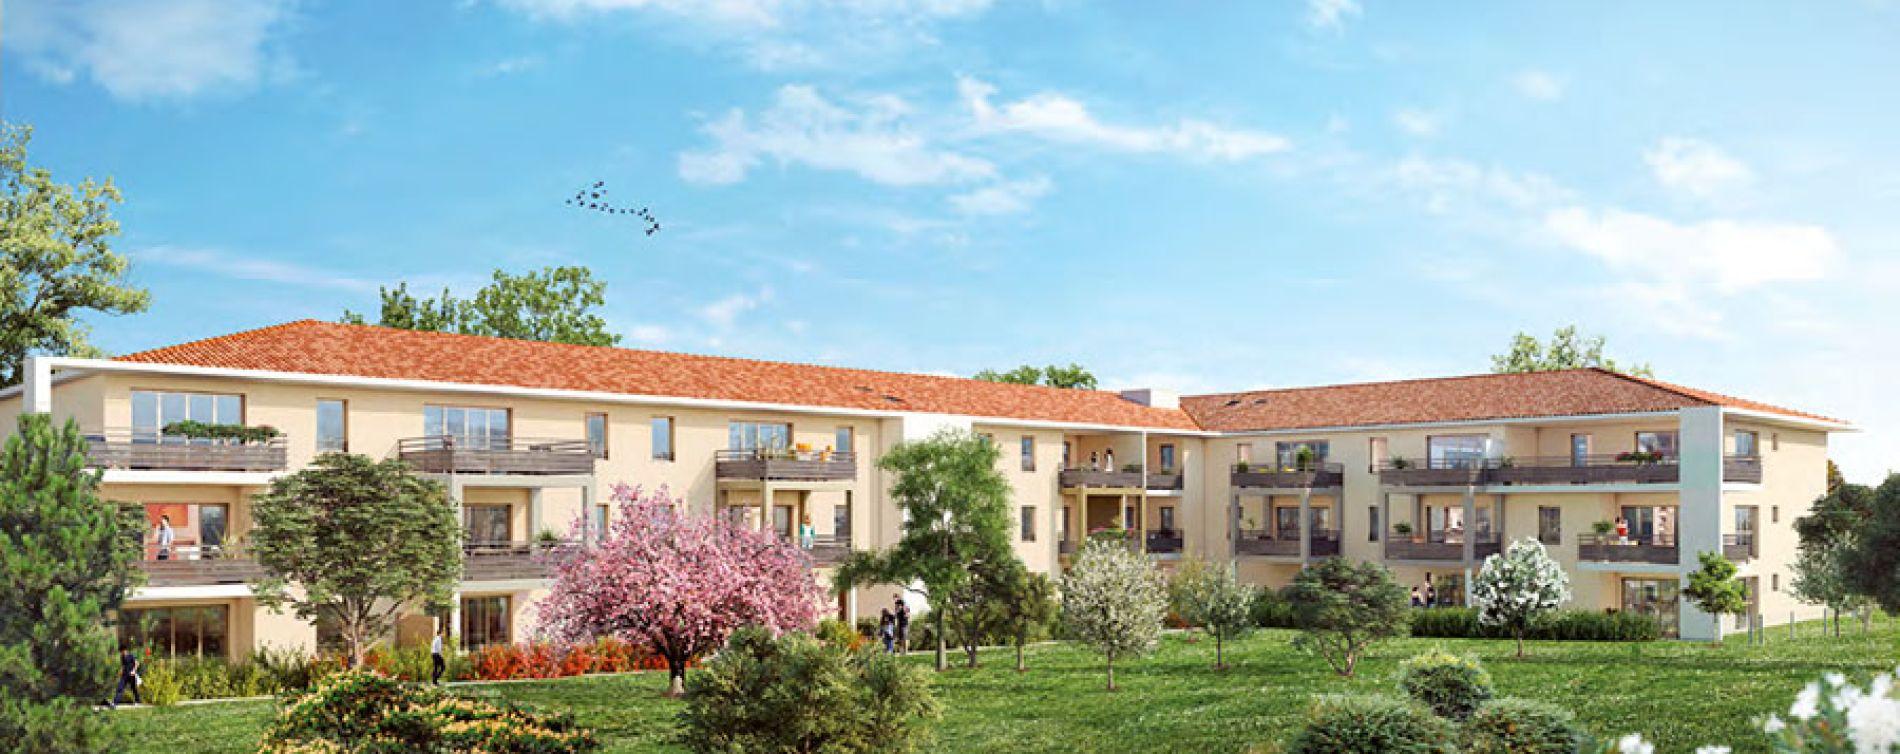 Ekinox aix en provence programme immobilier neuf n 211719 - Residence les jardins d arcadie aix en provence ...